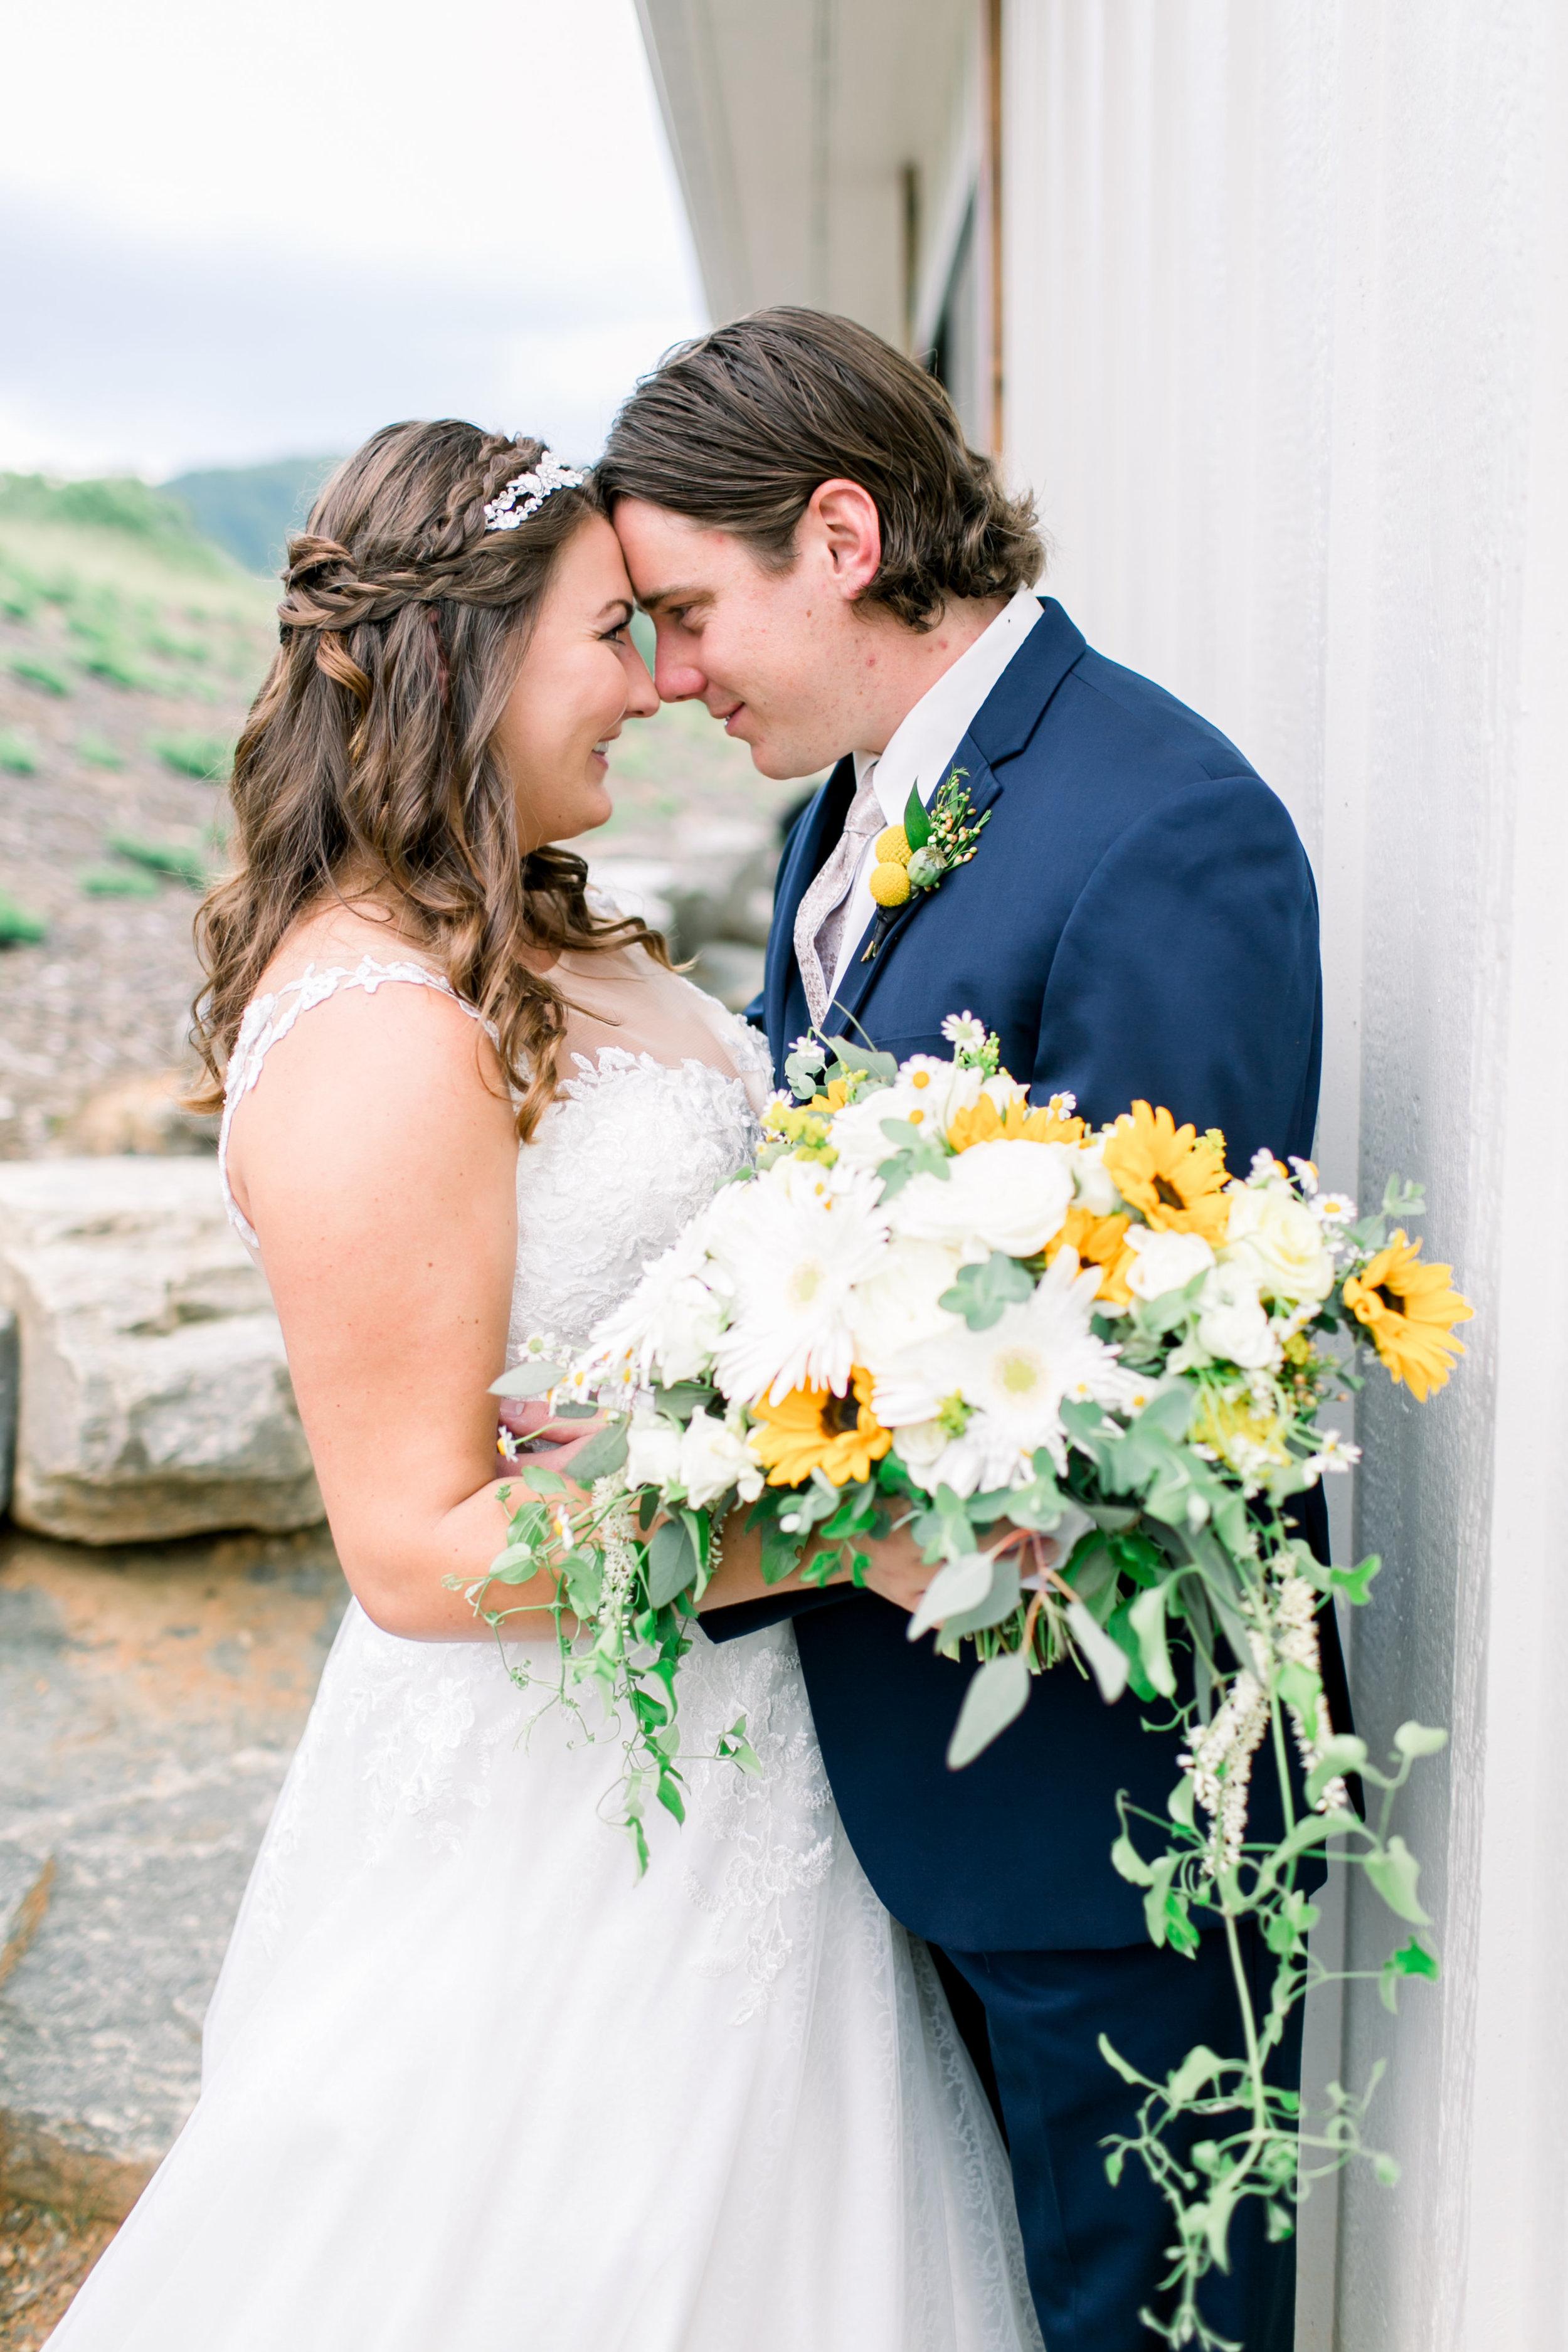 Joy-Unscripted-Wedding-Calligraphy-Kendall-25.jpg